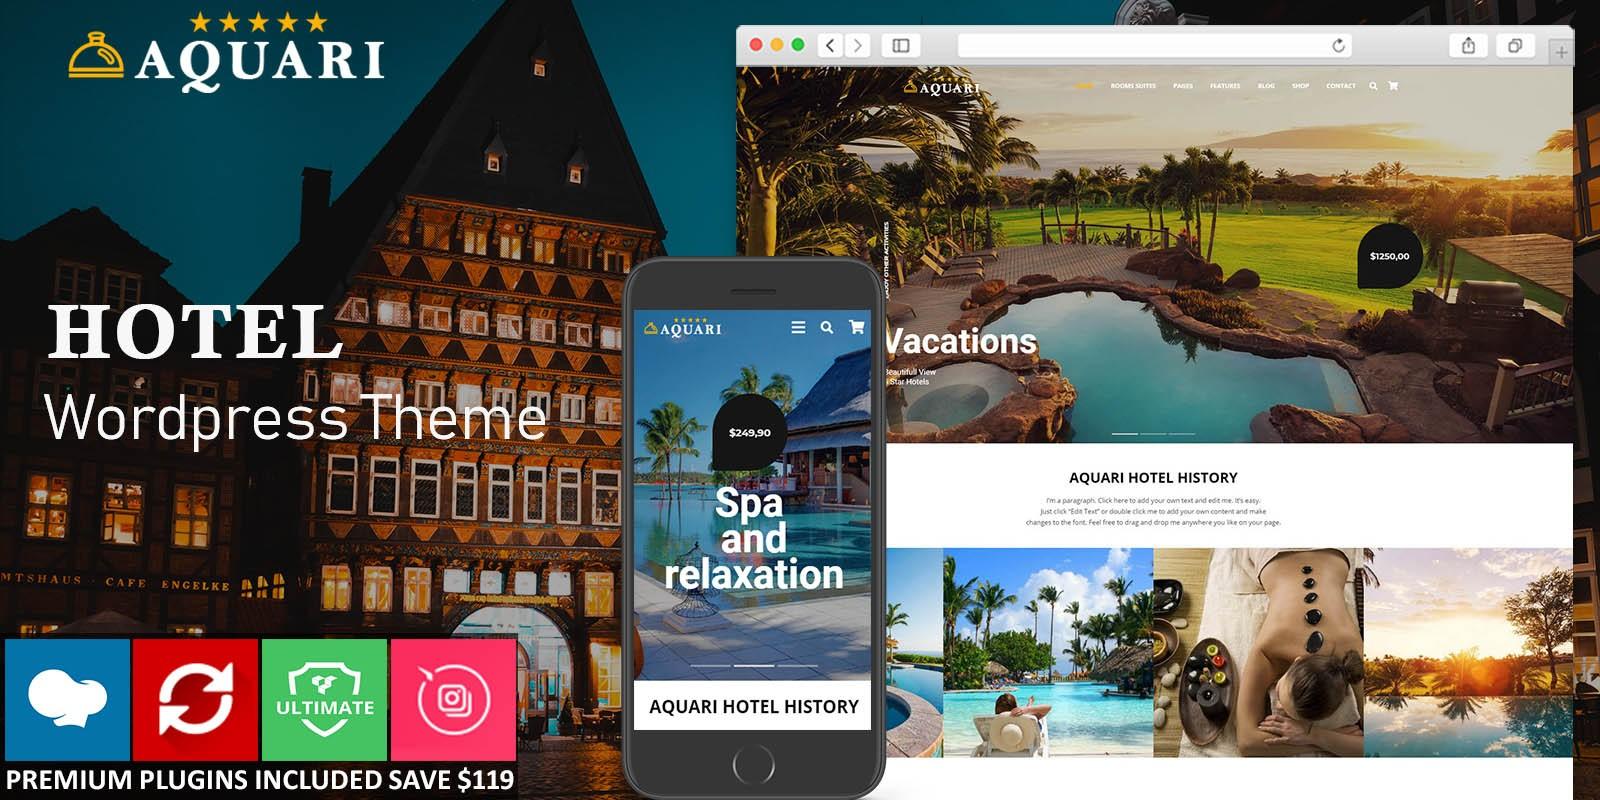 Aquari - a luxury hotel theme